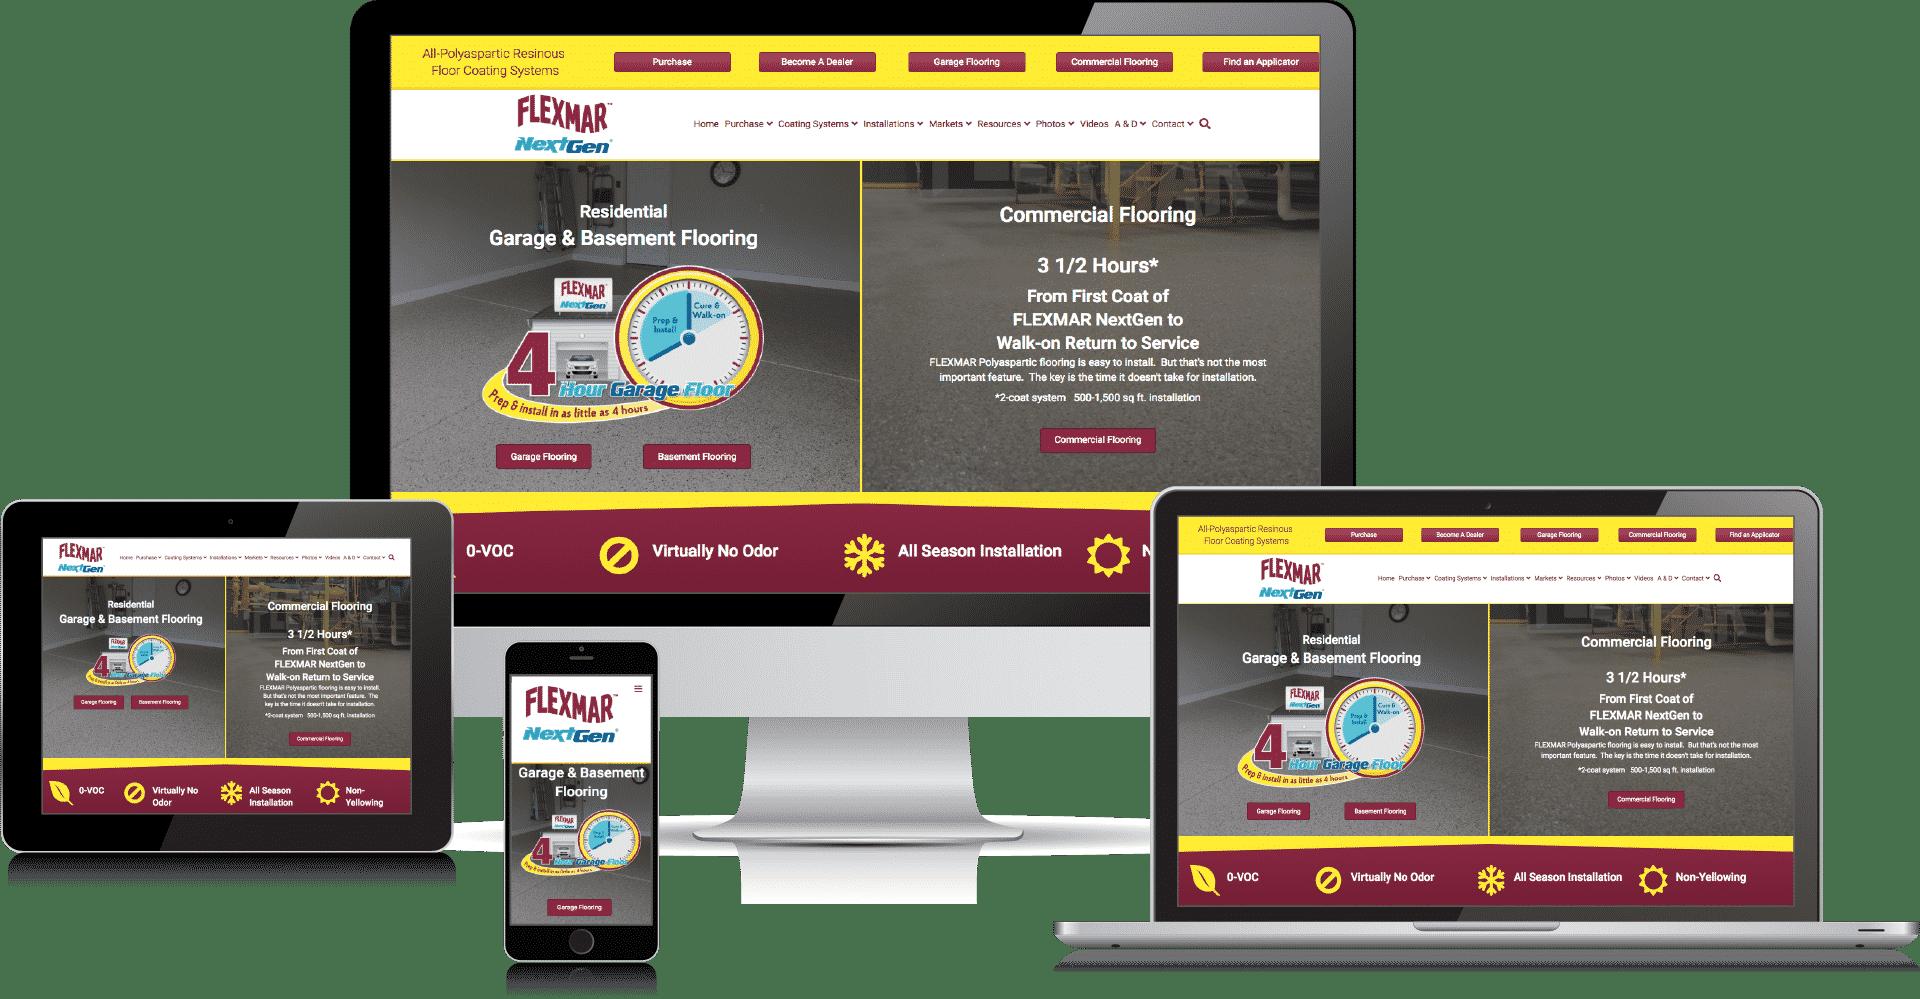 flexmar website